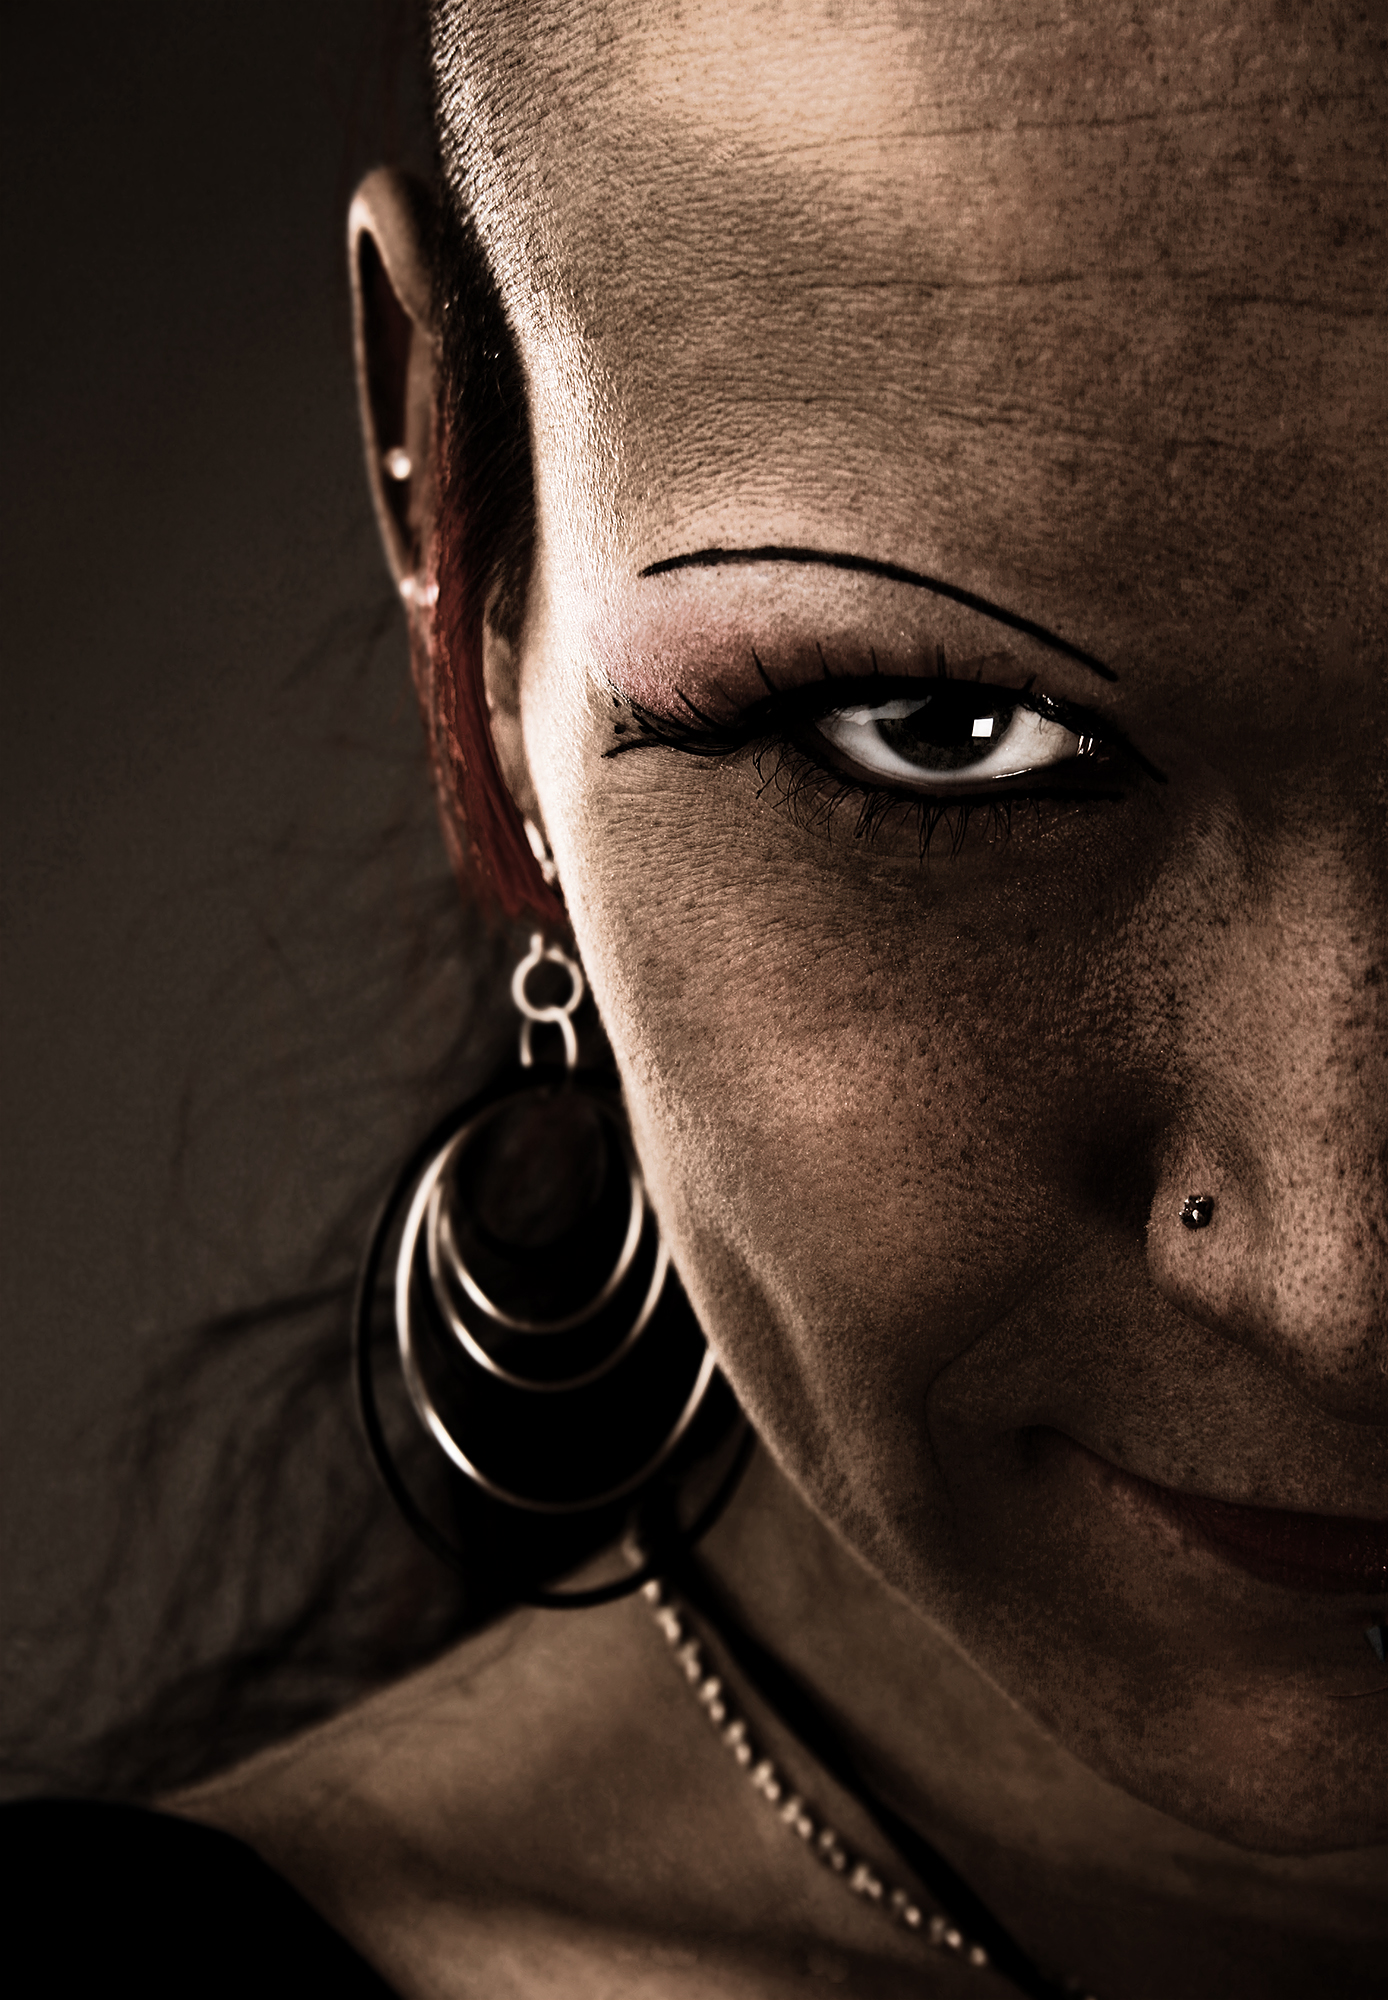 Martin Geisler Portraits Fotografie Photography